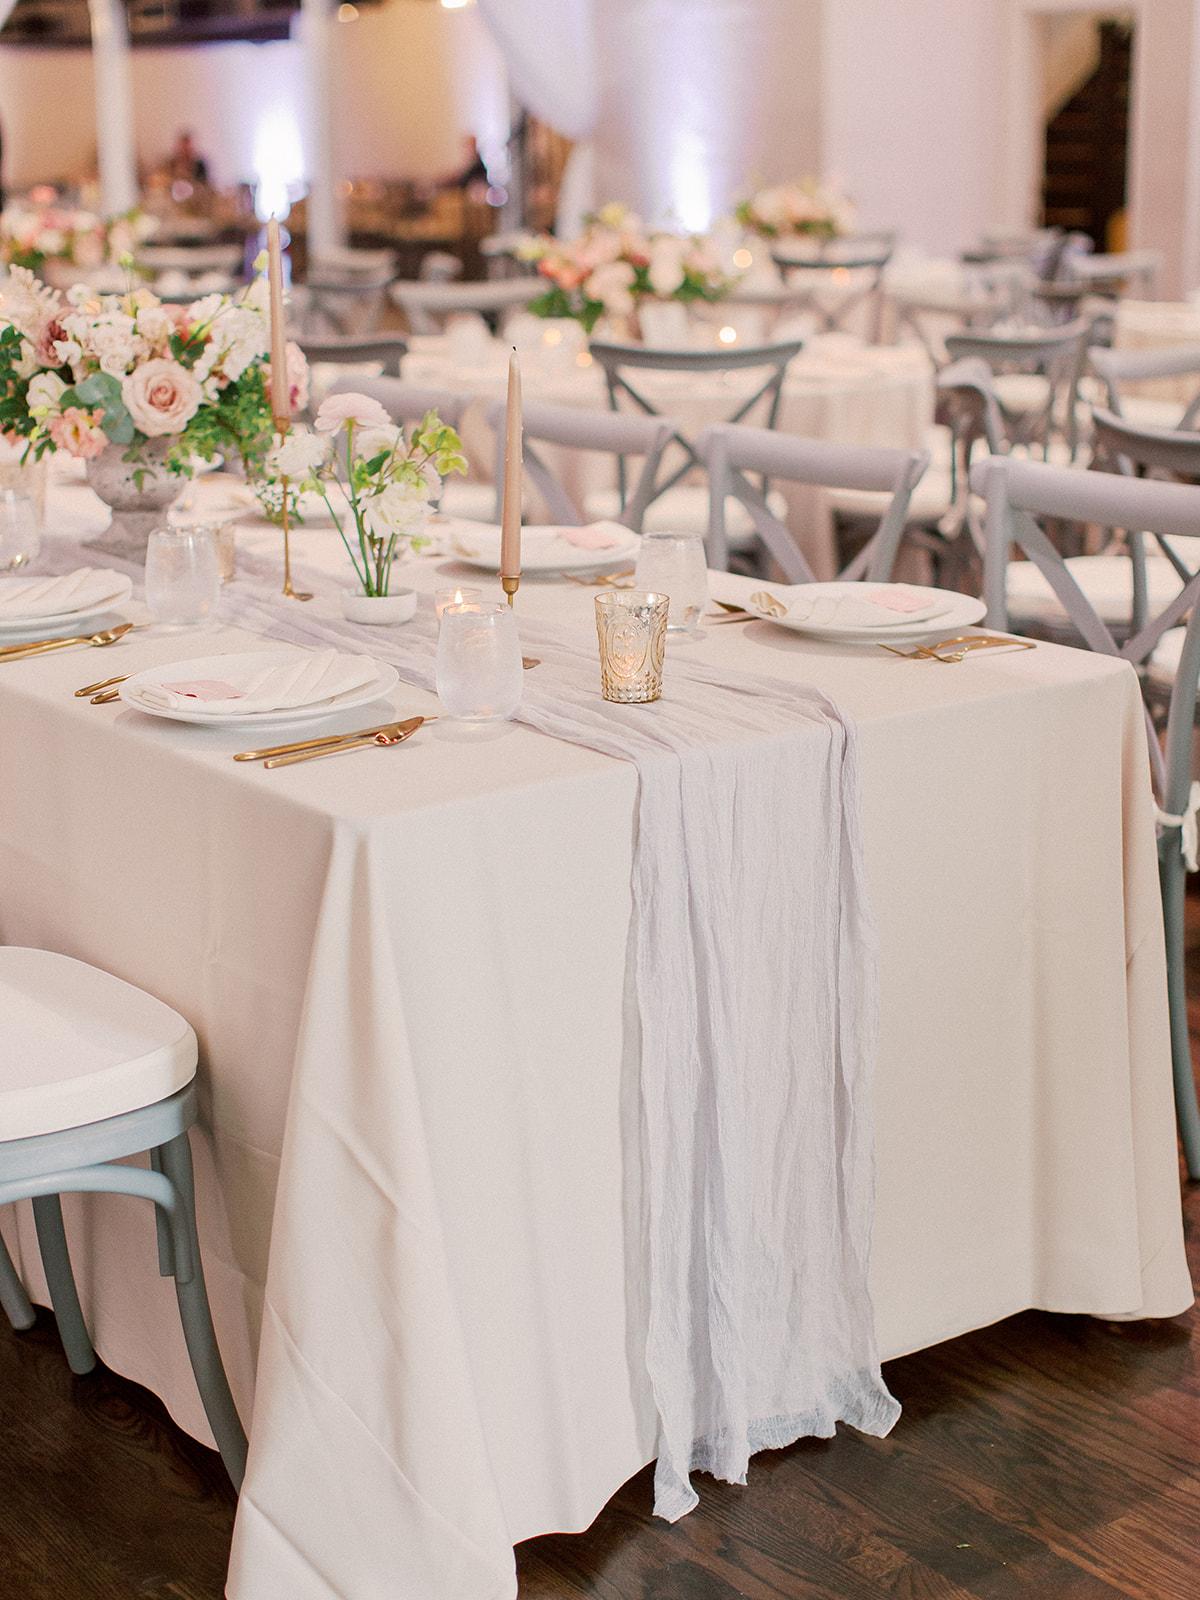 Dusty Rose and Blush Historic Post Office Hampton Virginia June Wedding Courtney Inghram Floral Design